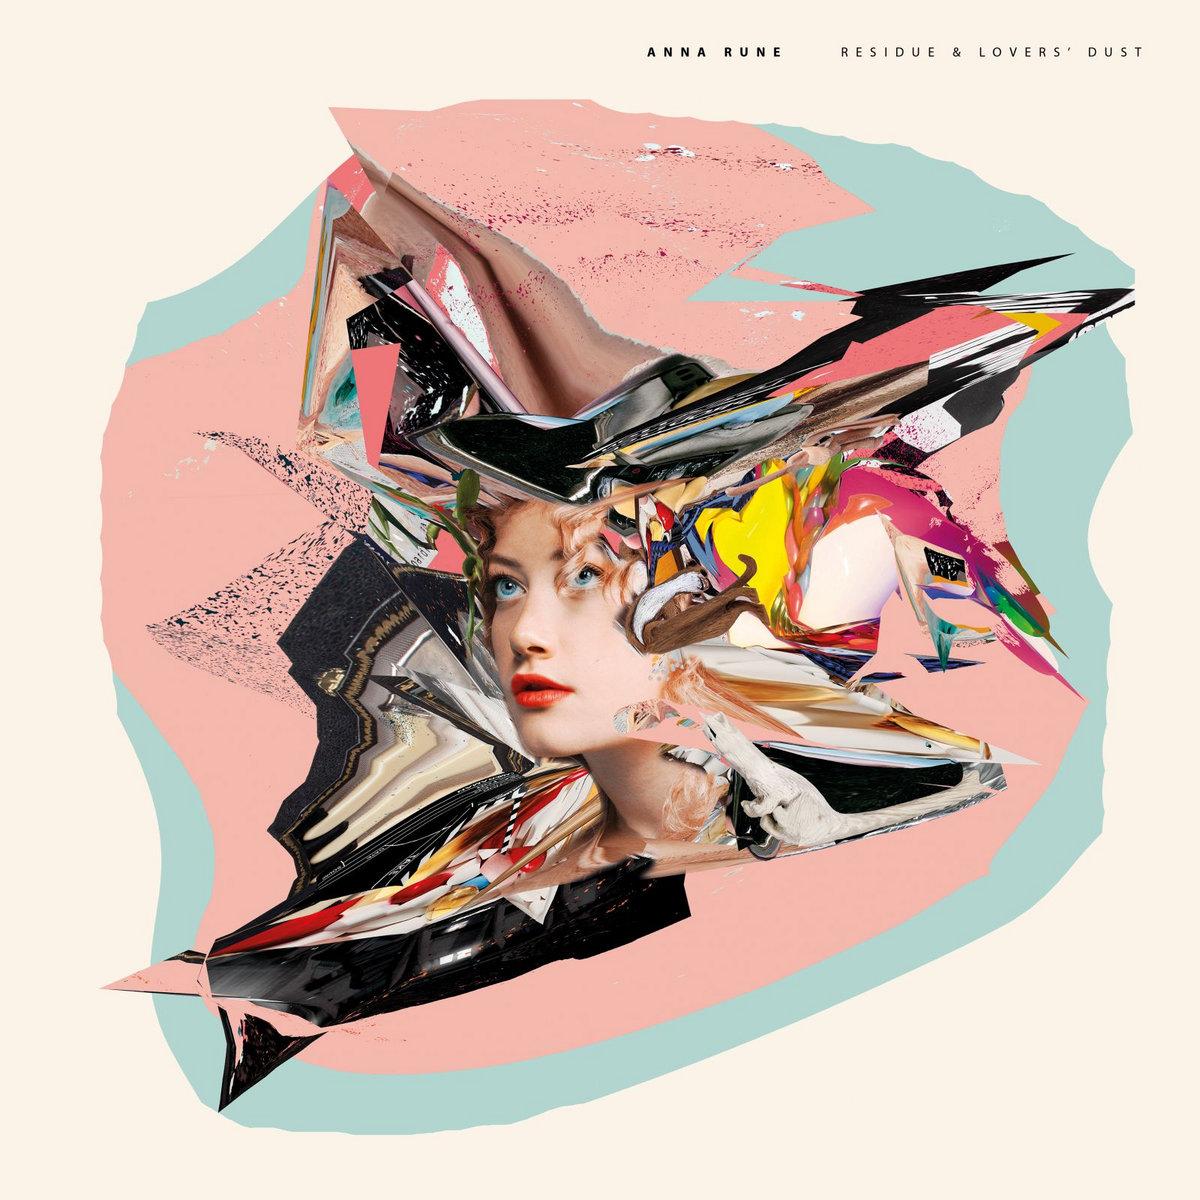 Somnambulist | Anna Rune Album